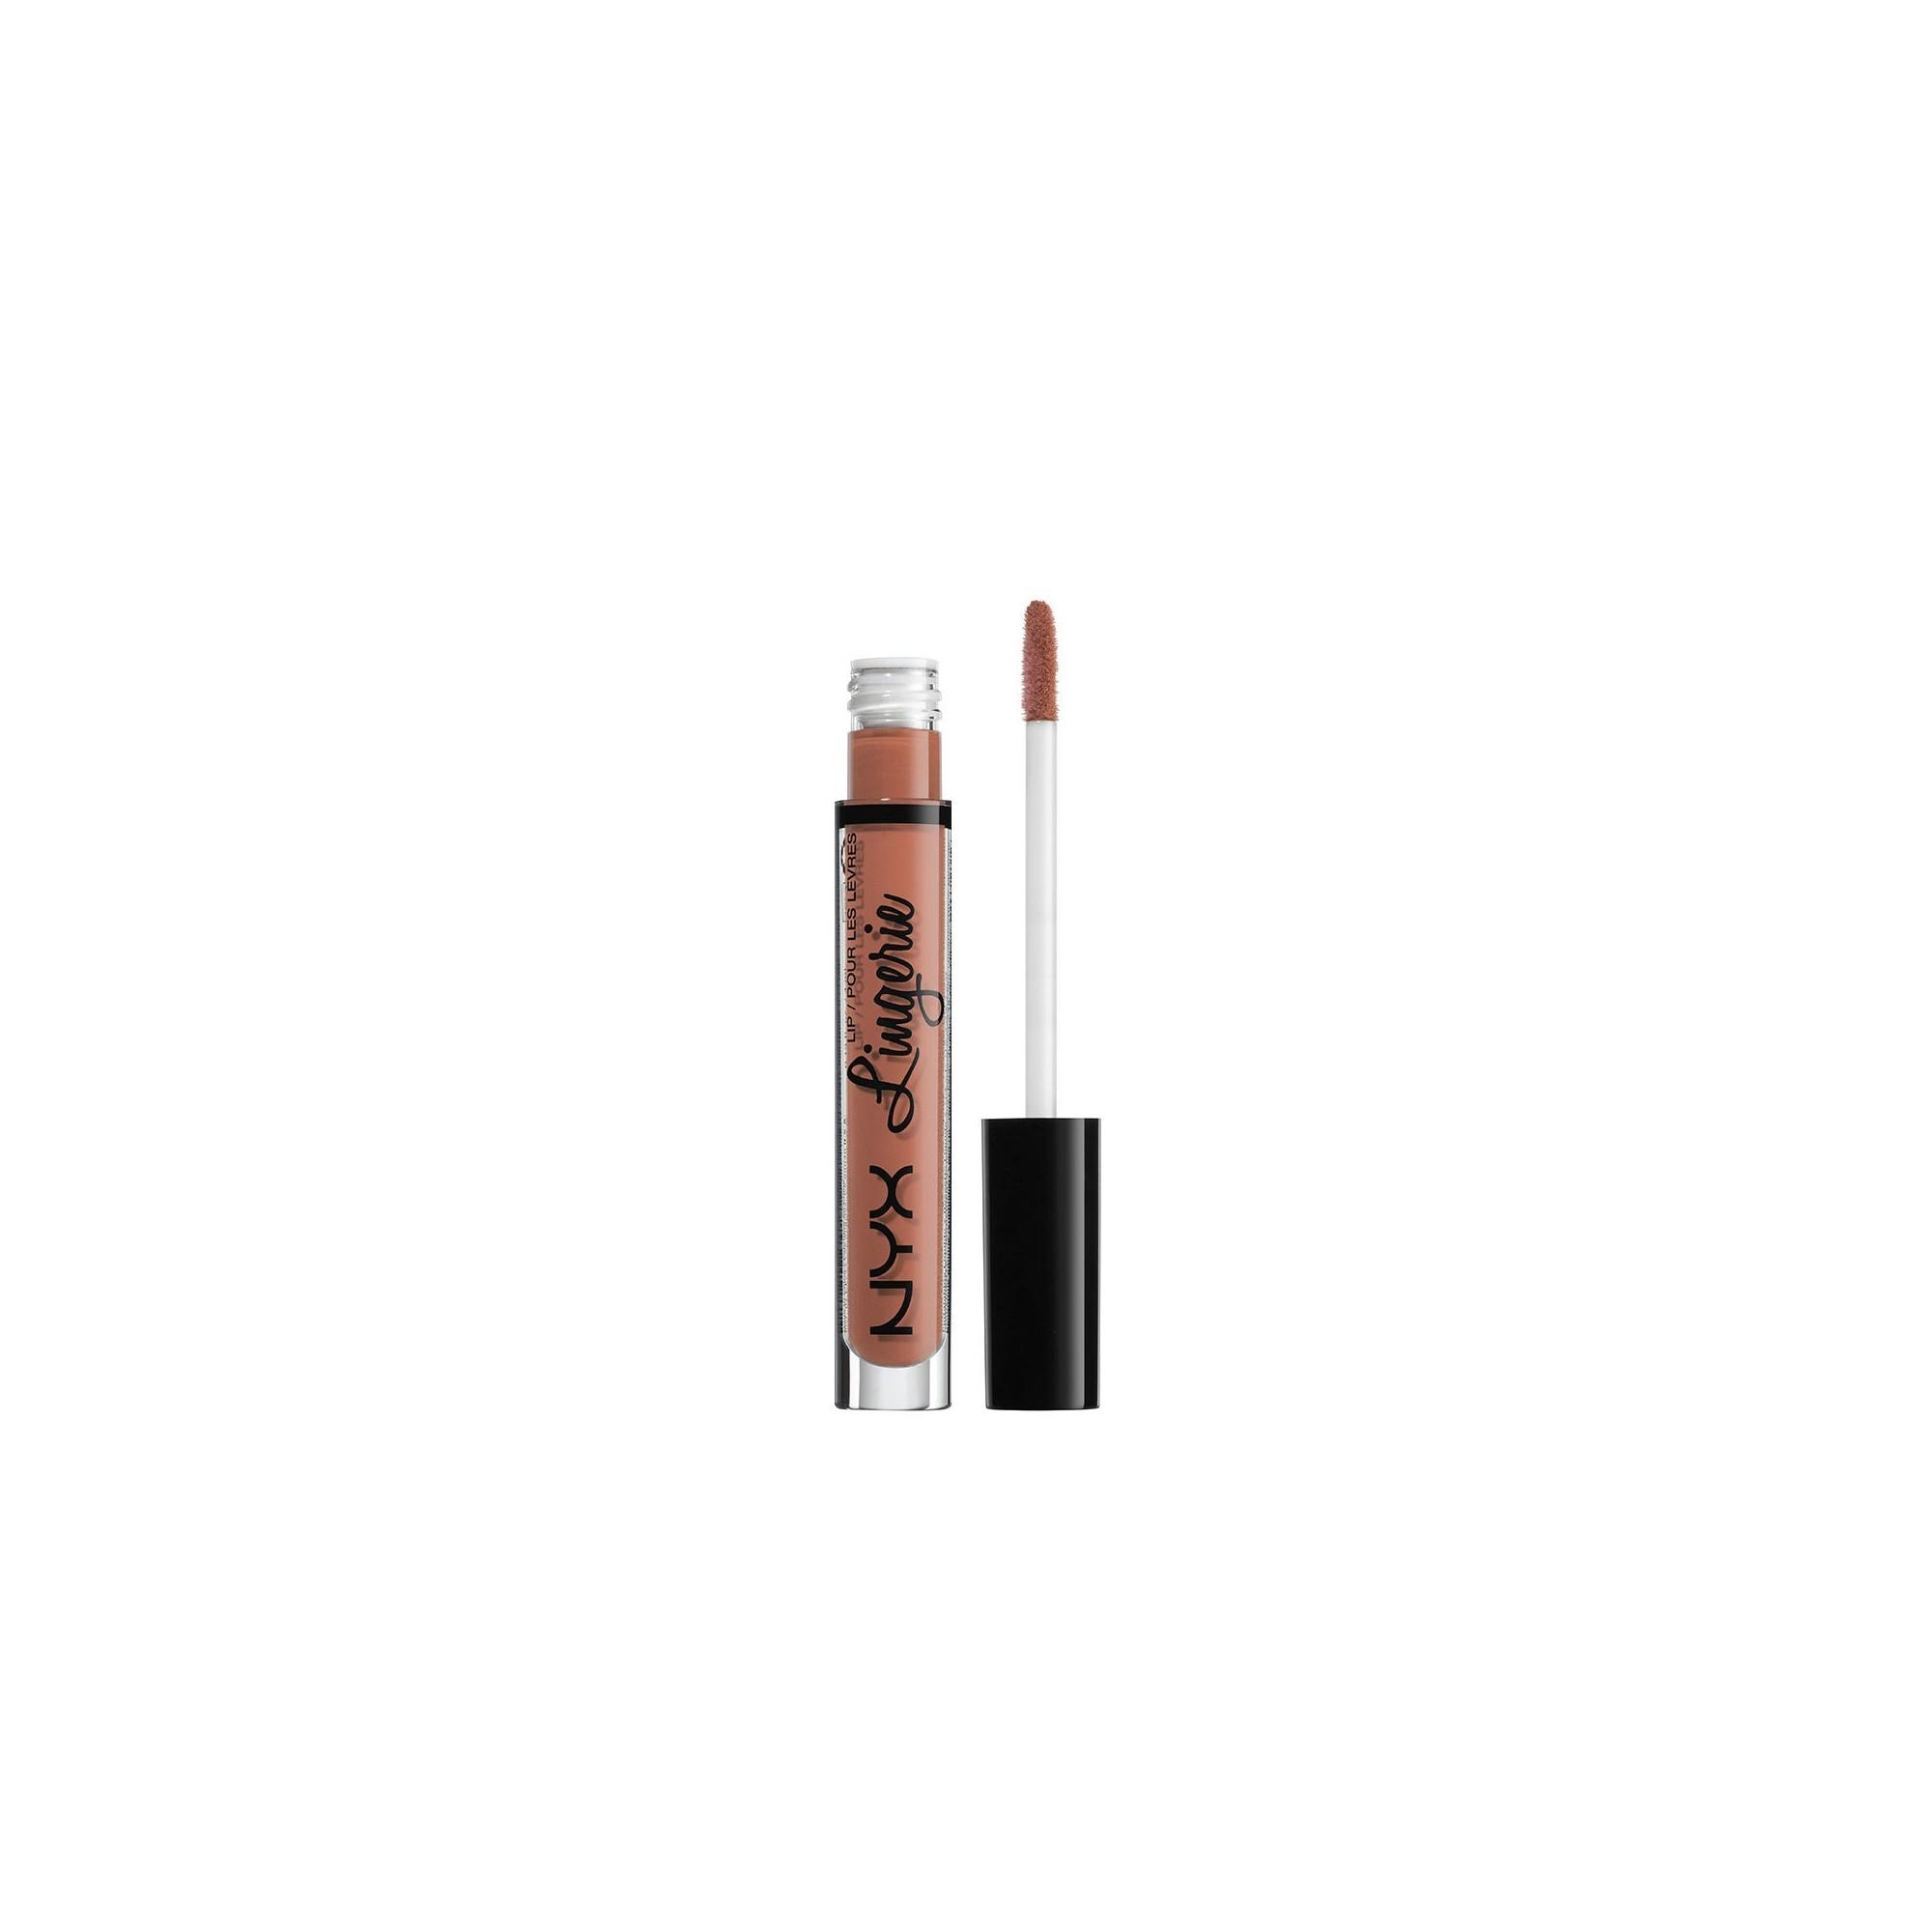 NYX Lip Lingerie Lace Ruffle Trim